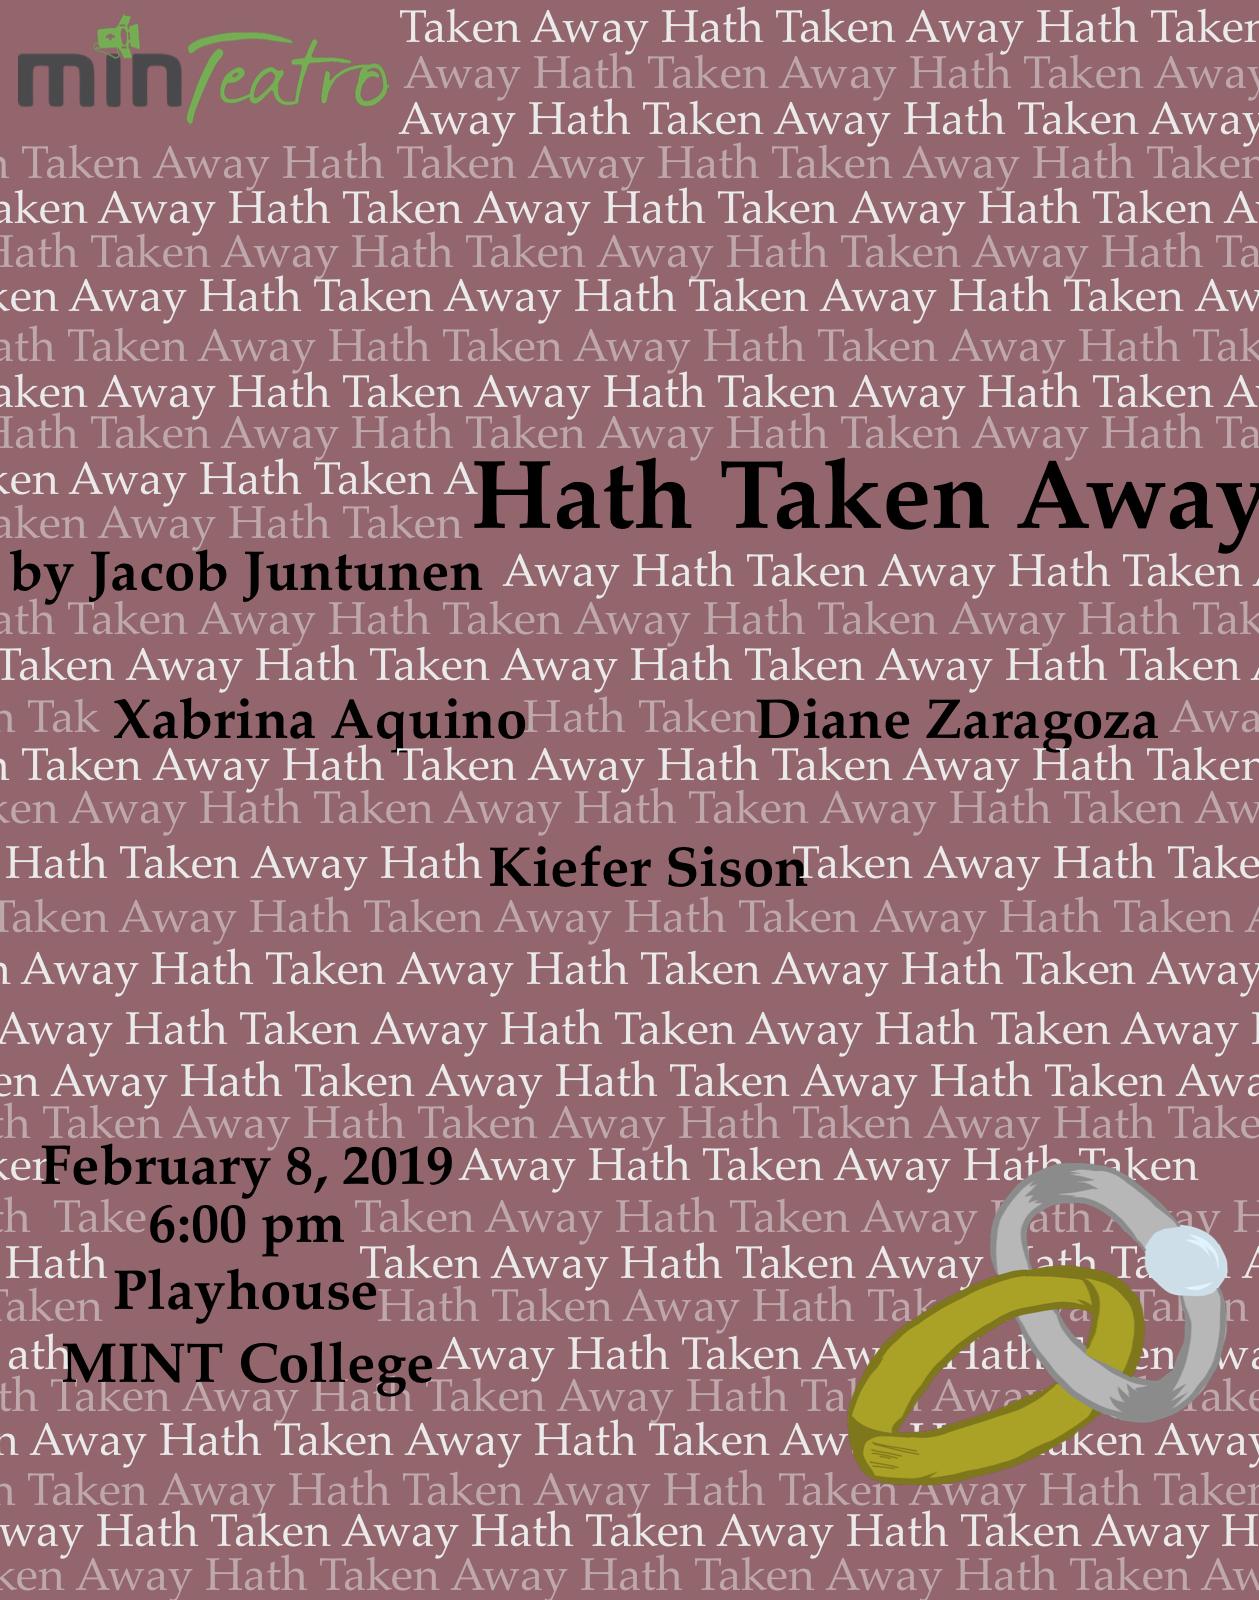 Hath taken Away.JPG